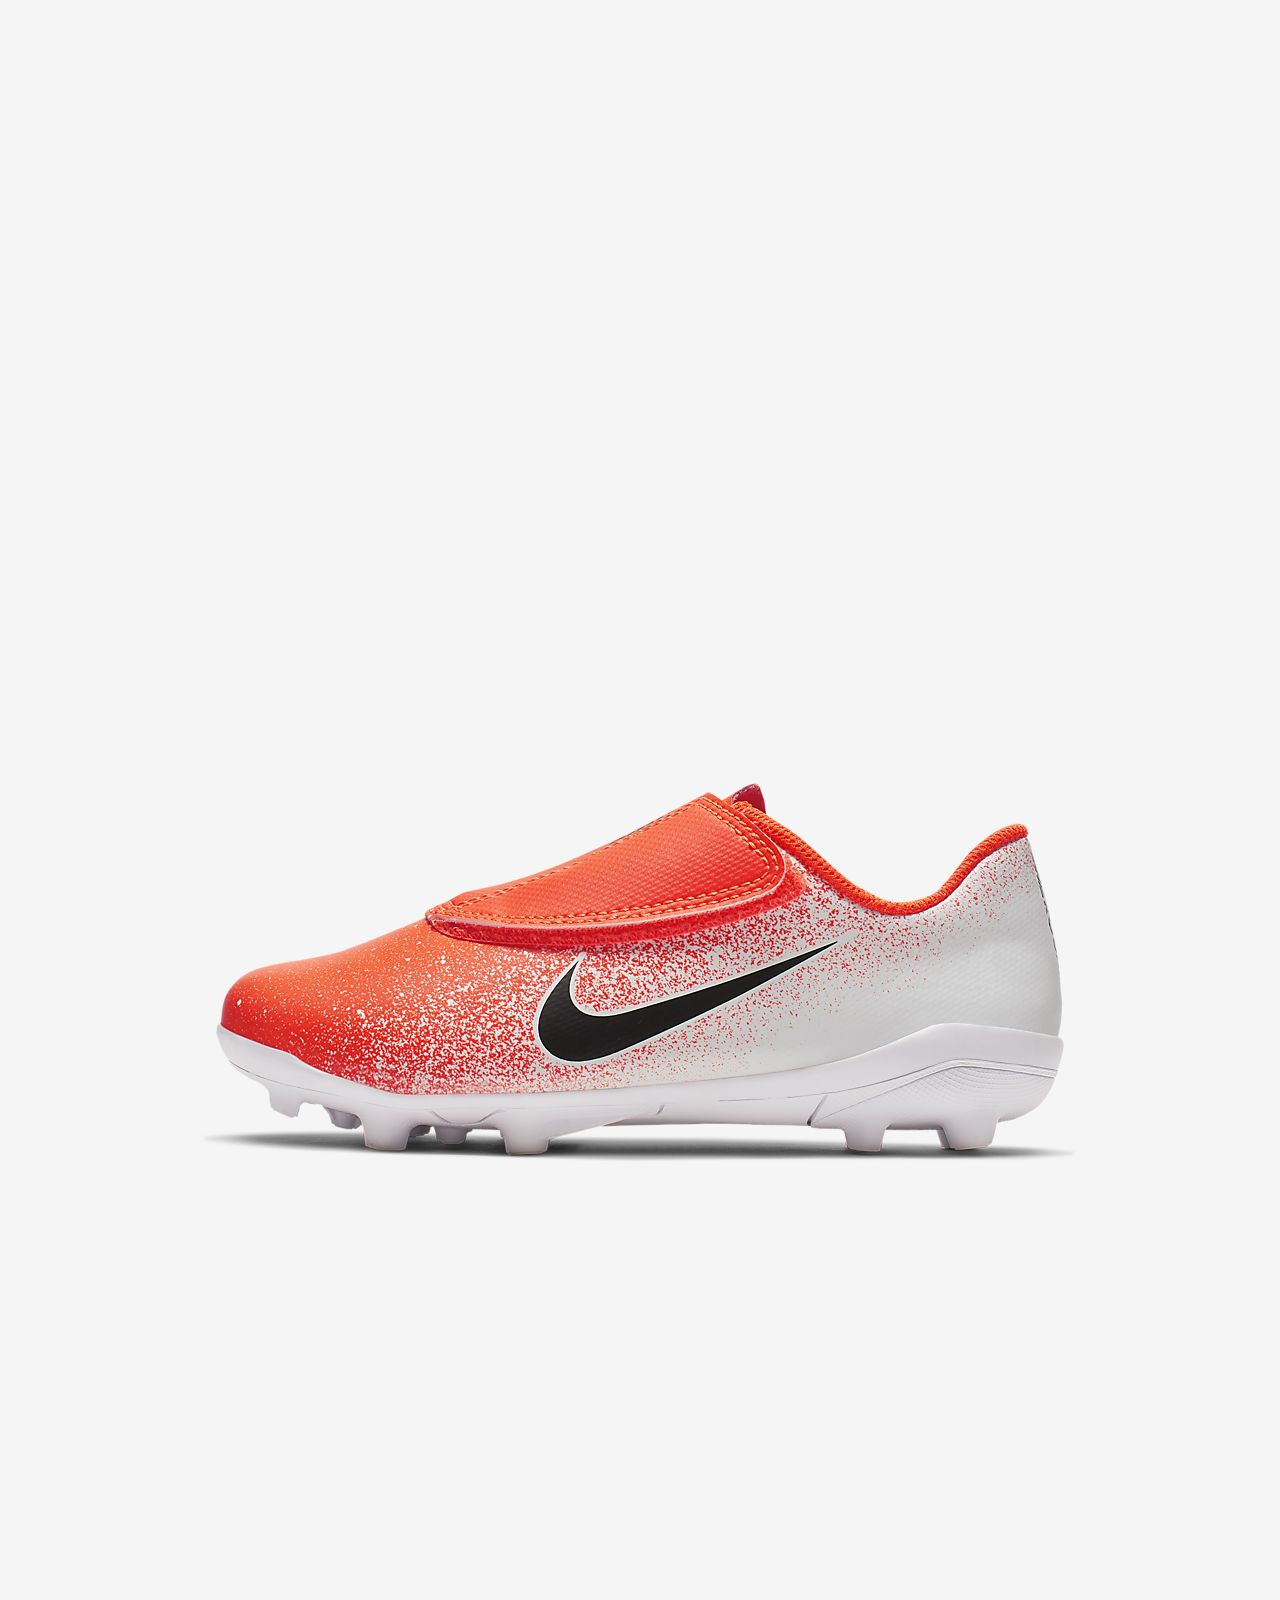 b77a20a52 Nike Jr. Vapor 12 Club MG Little Kids  Multi-Ground Soccer Shoe ...